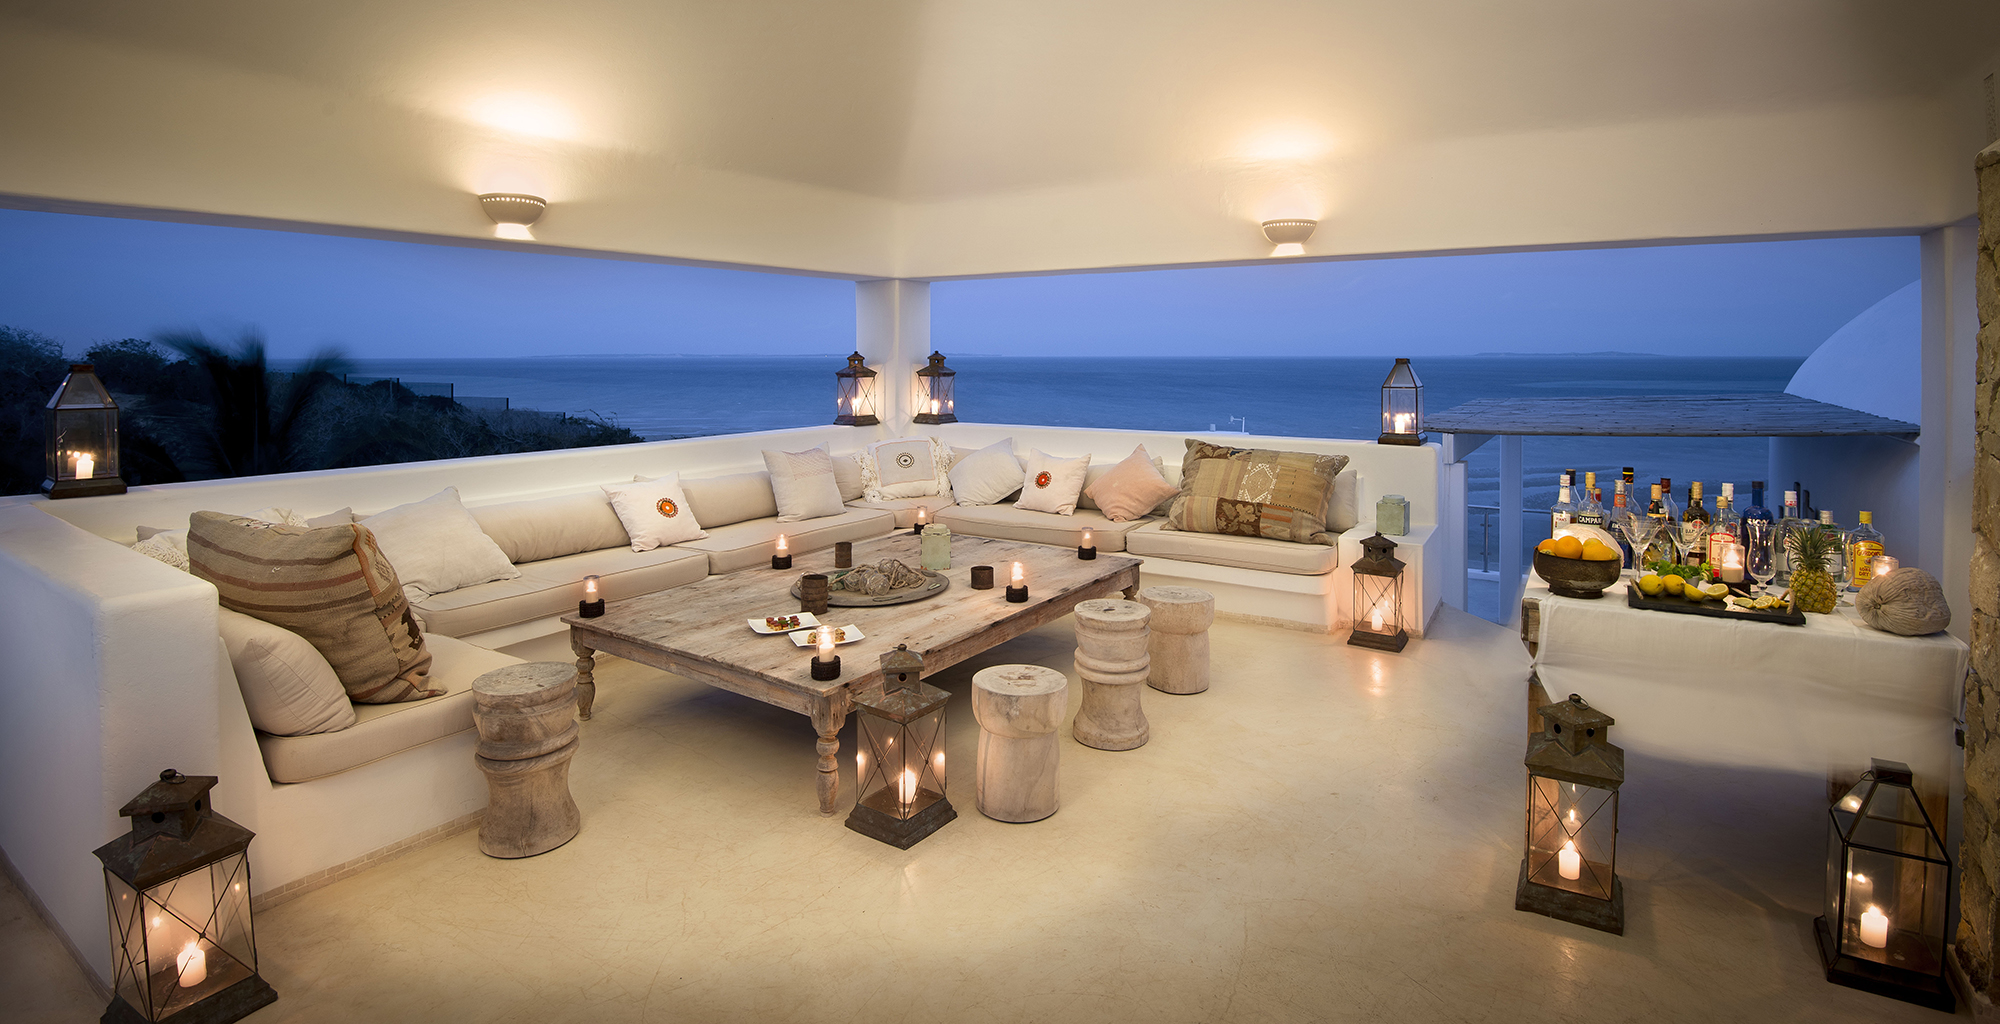 Mozambique-Bazaruto-Archipelago-Santorini-Living-Room